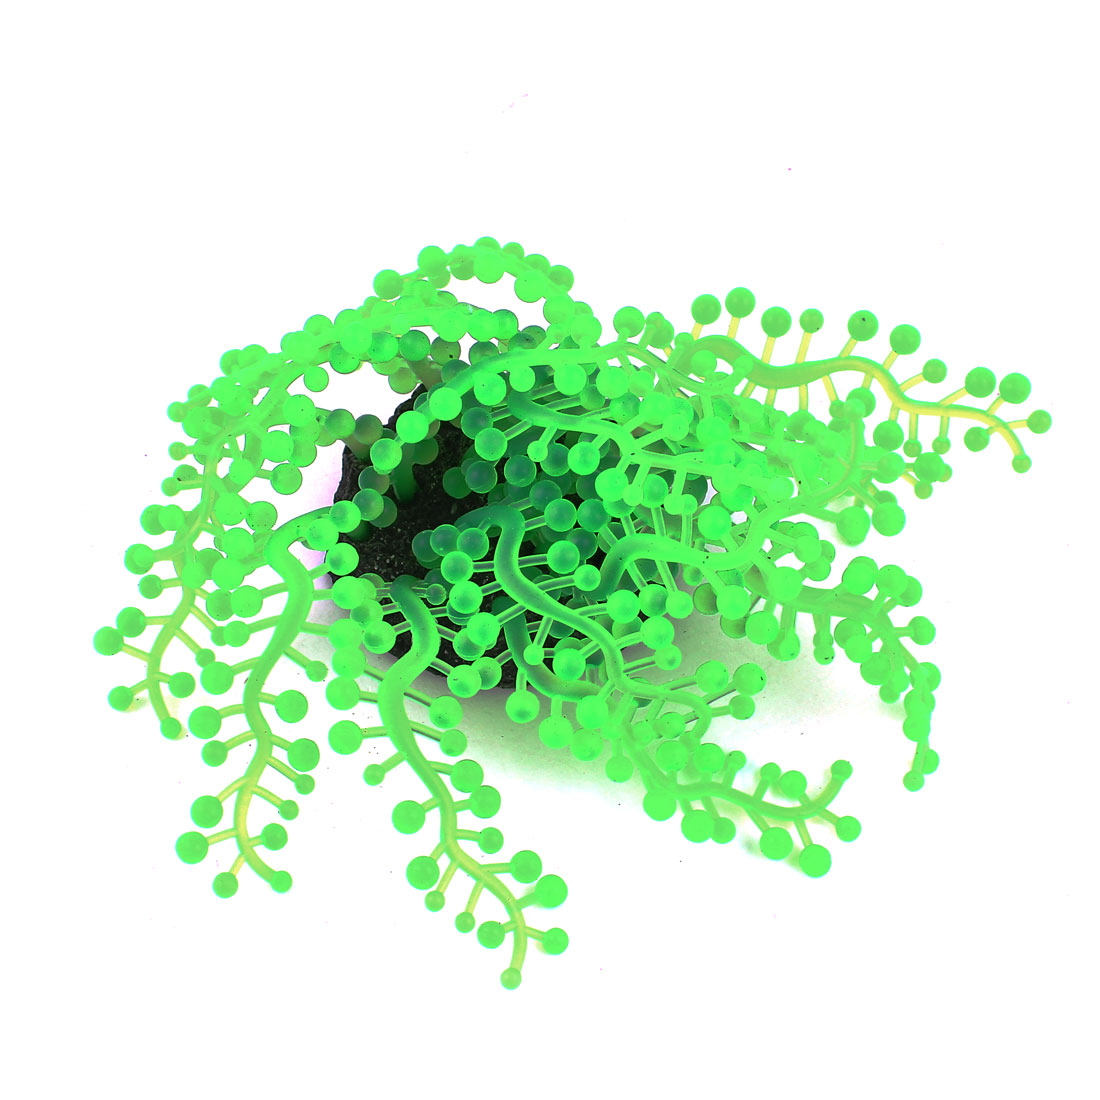 "3.7"" High Soft Silicone Aquarium Fish Tank Underwater Plants Decoration Green"